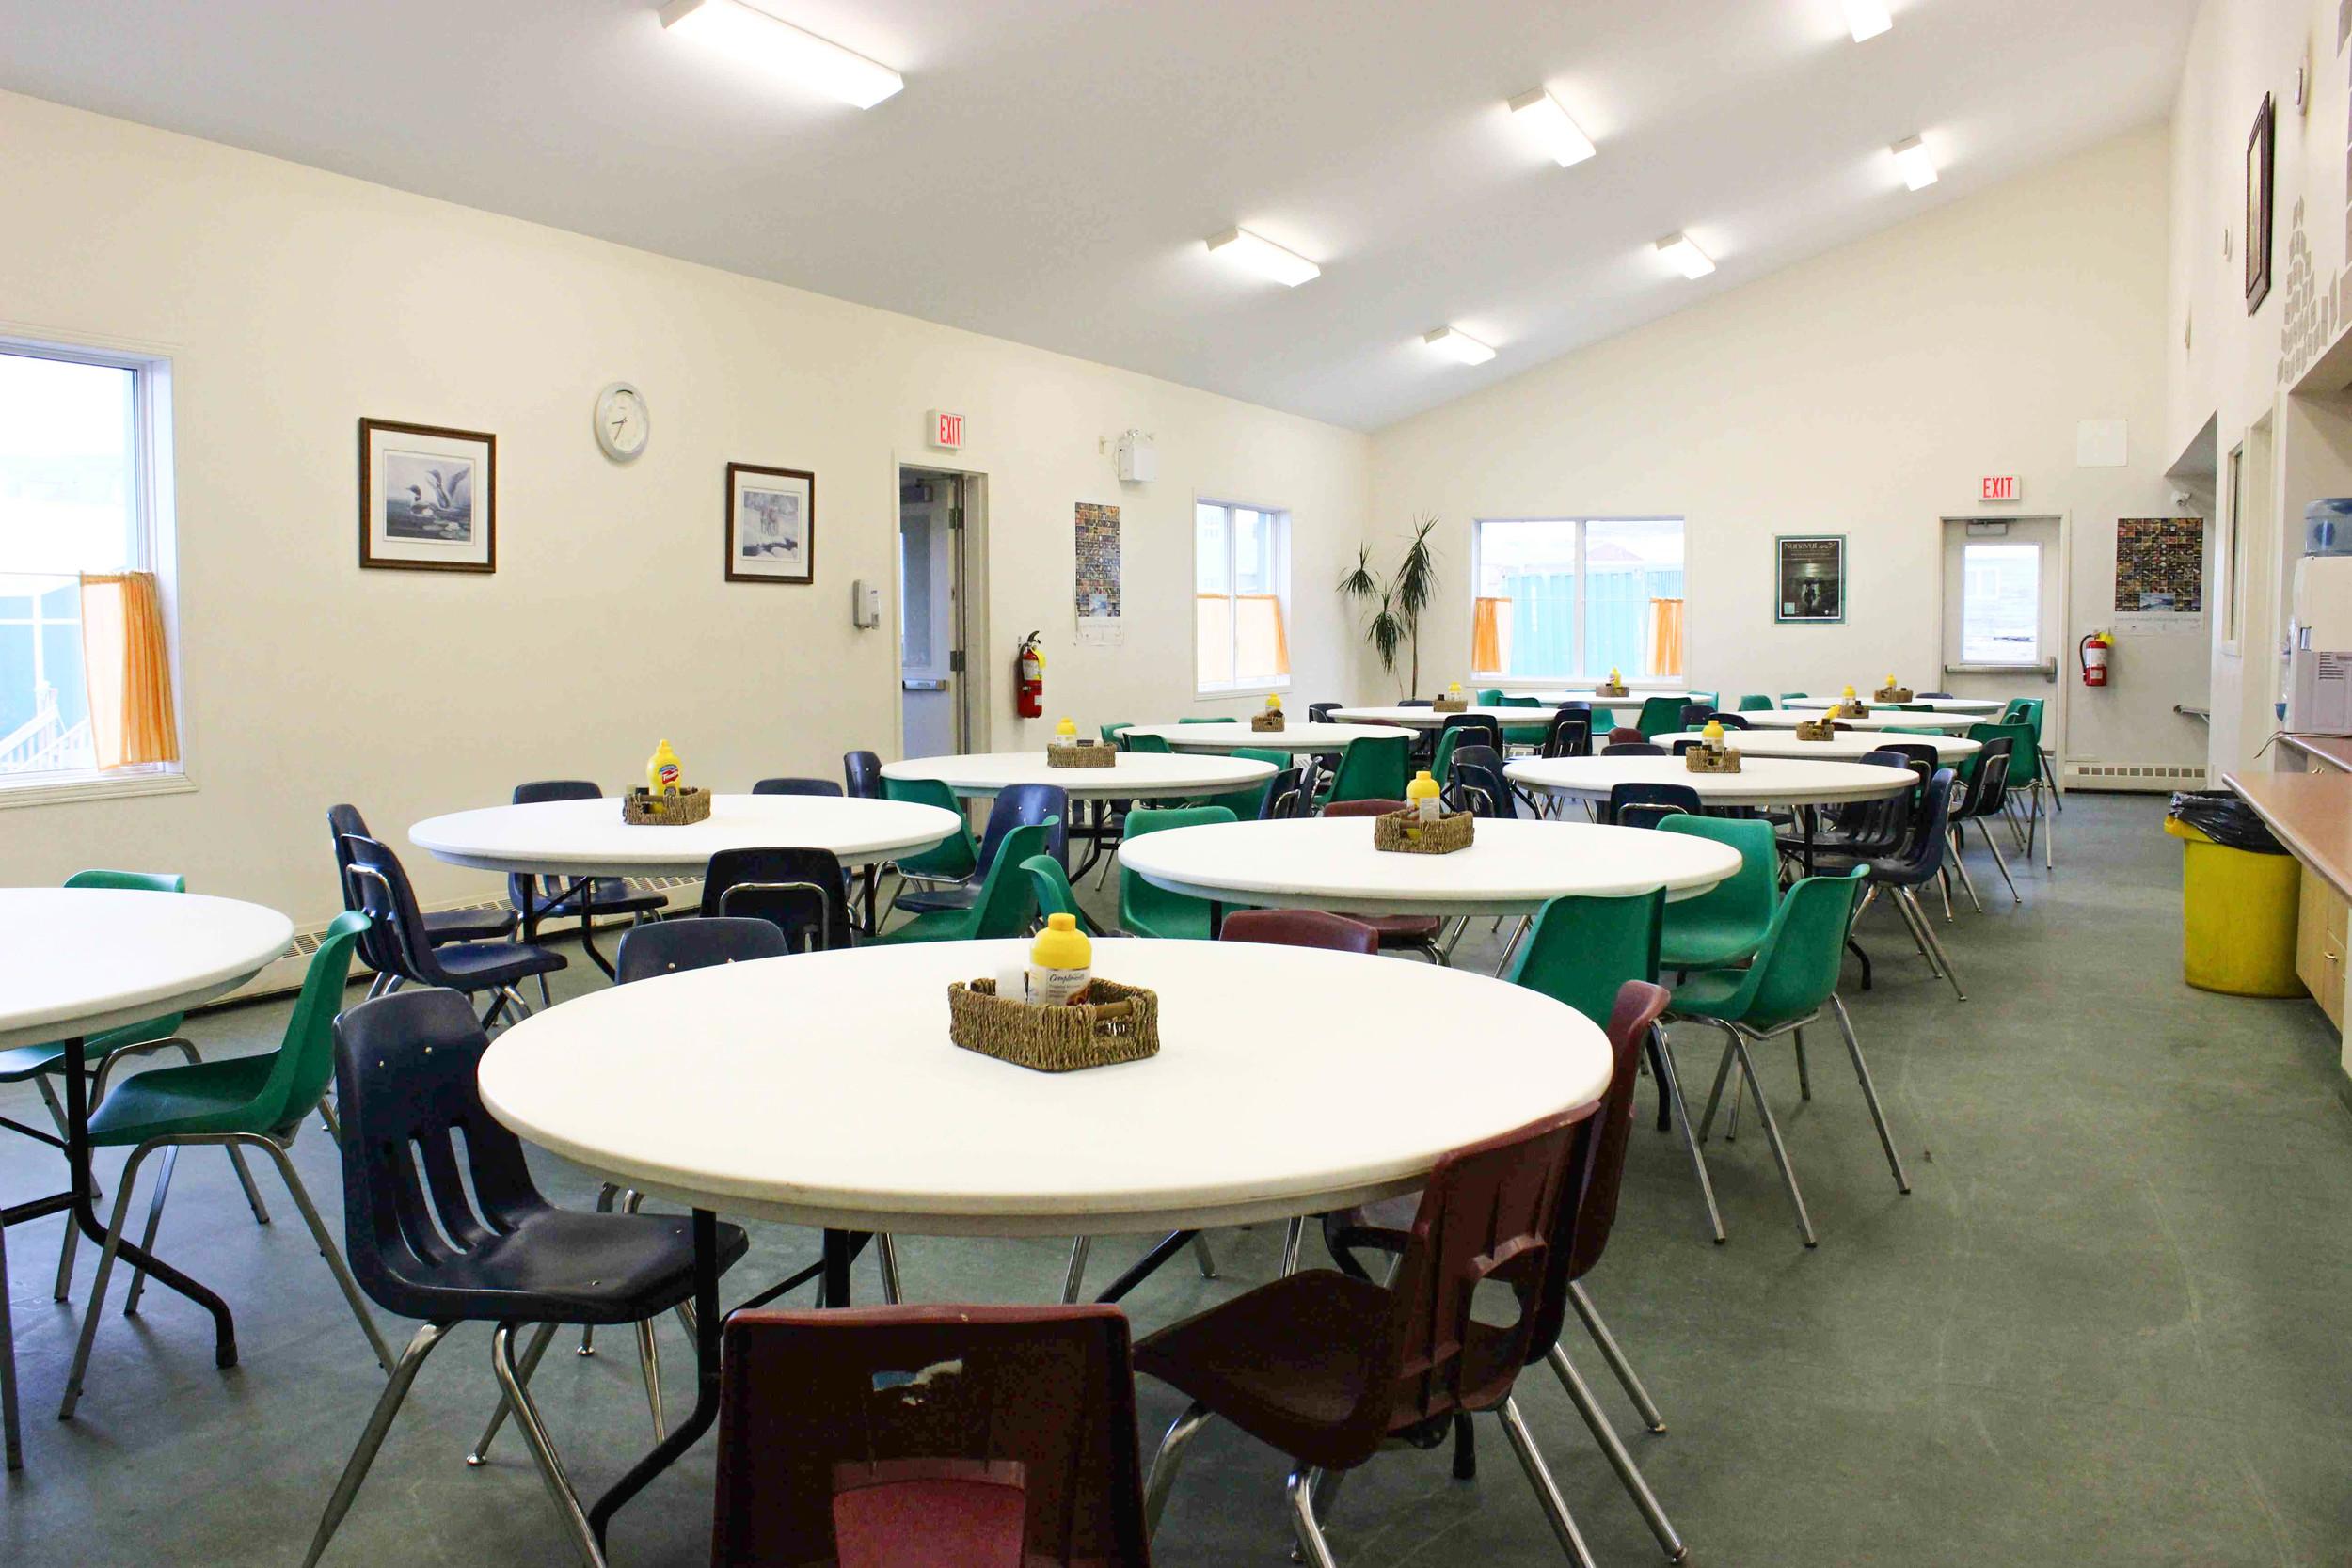 The Qayuqtuvik Society's 90-person dining room. Photo by Sarah Brandvold.